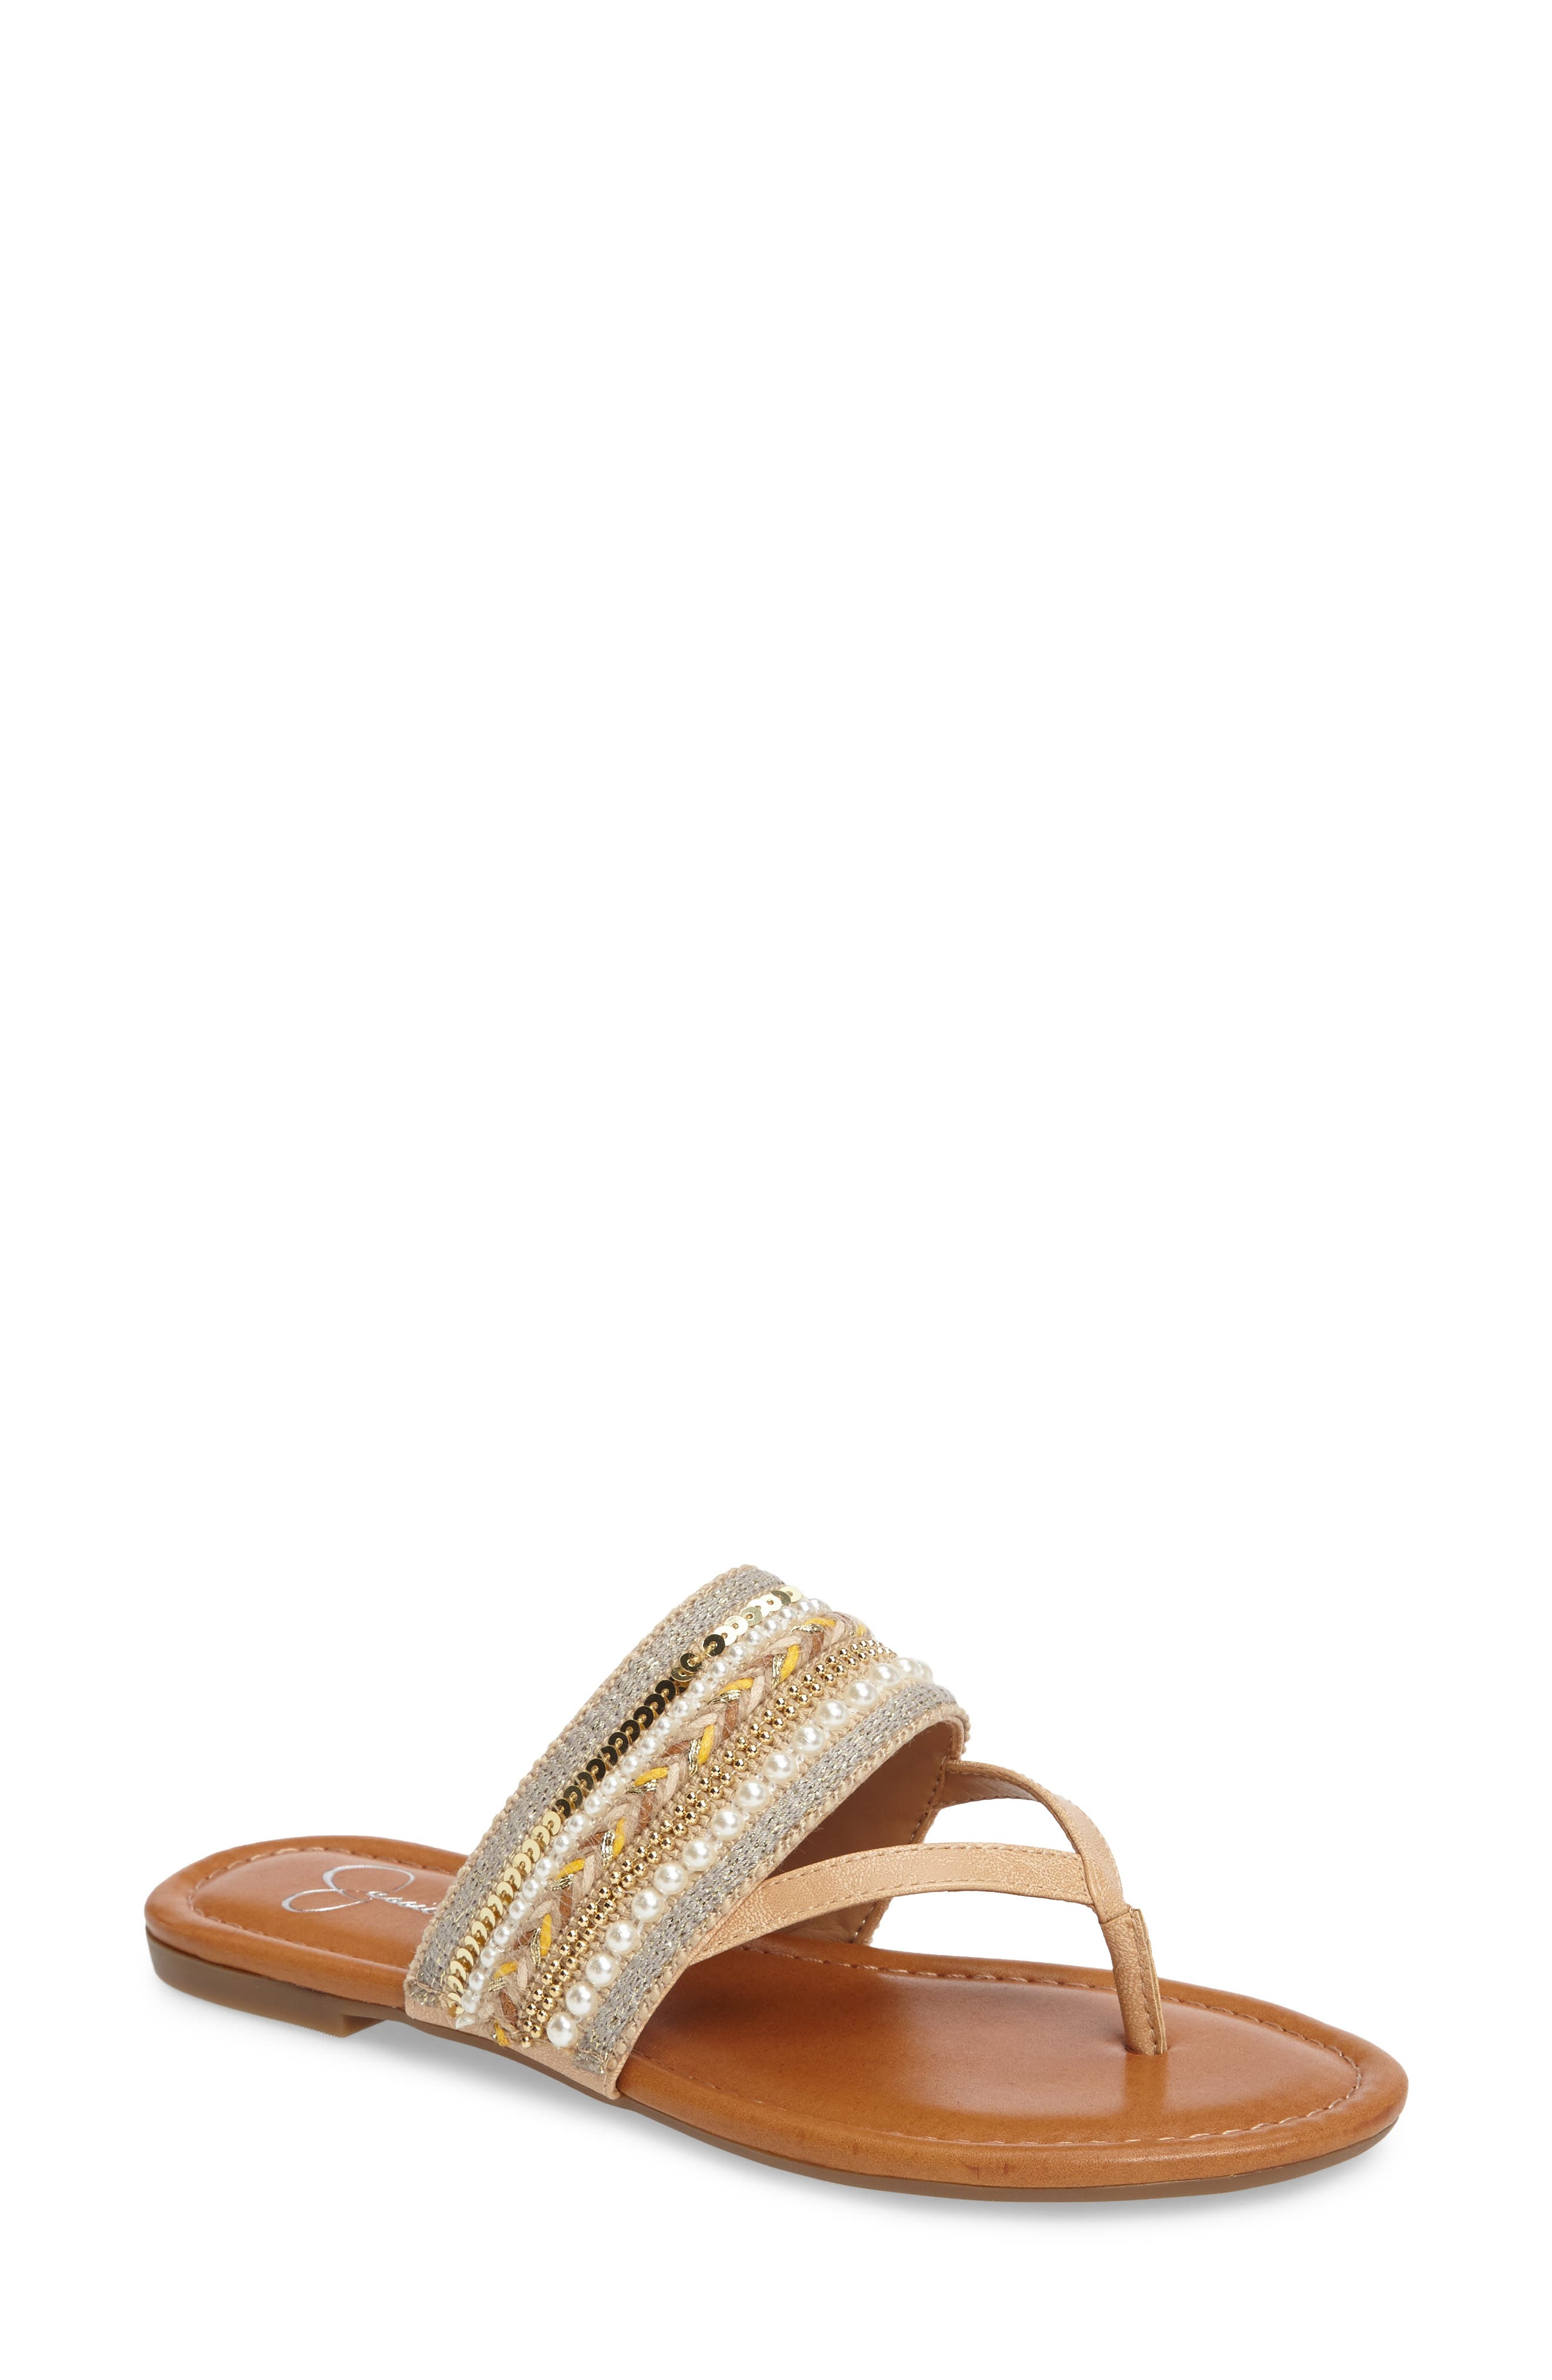 Jessica Simpson Ronette Embellished Flip Flop (Women)